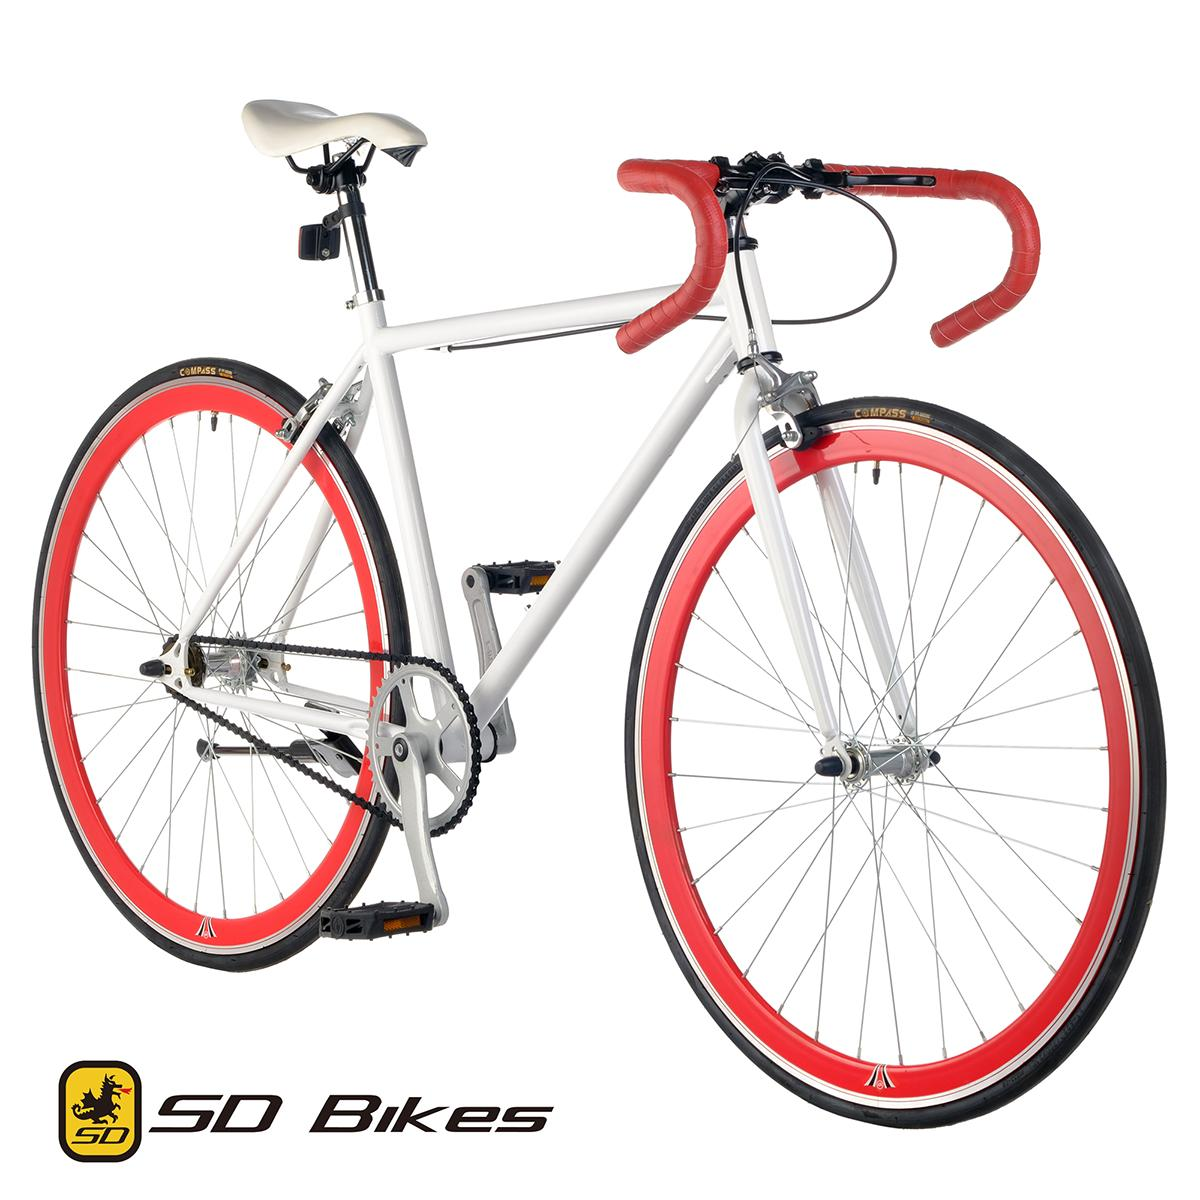 125415980ef SD Fixed Gear Single Speed Fixie Road Bike Drop Bar (Gloss White/Red)